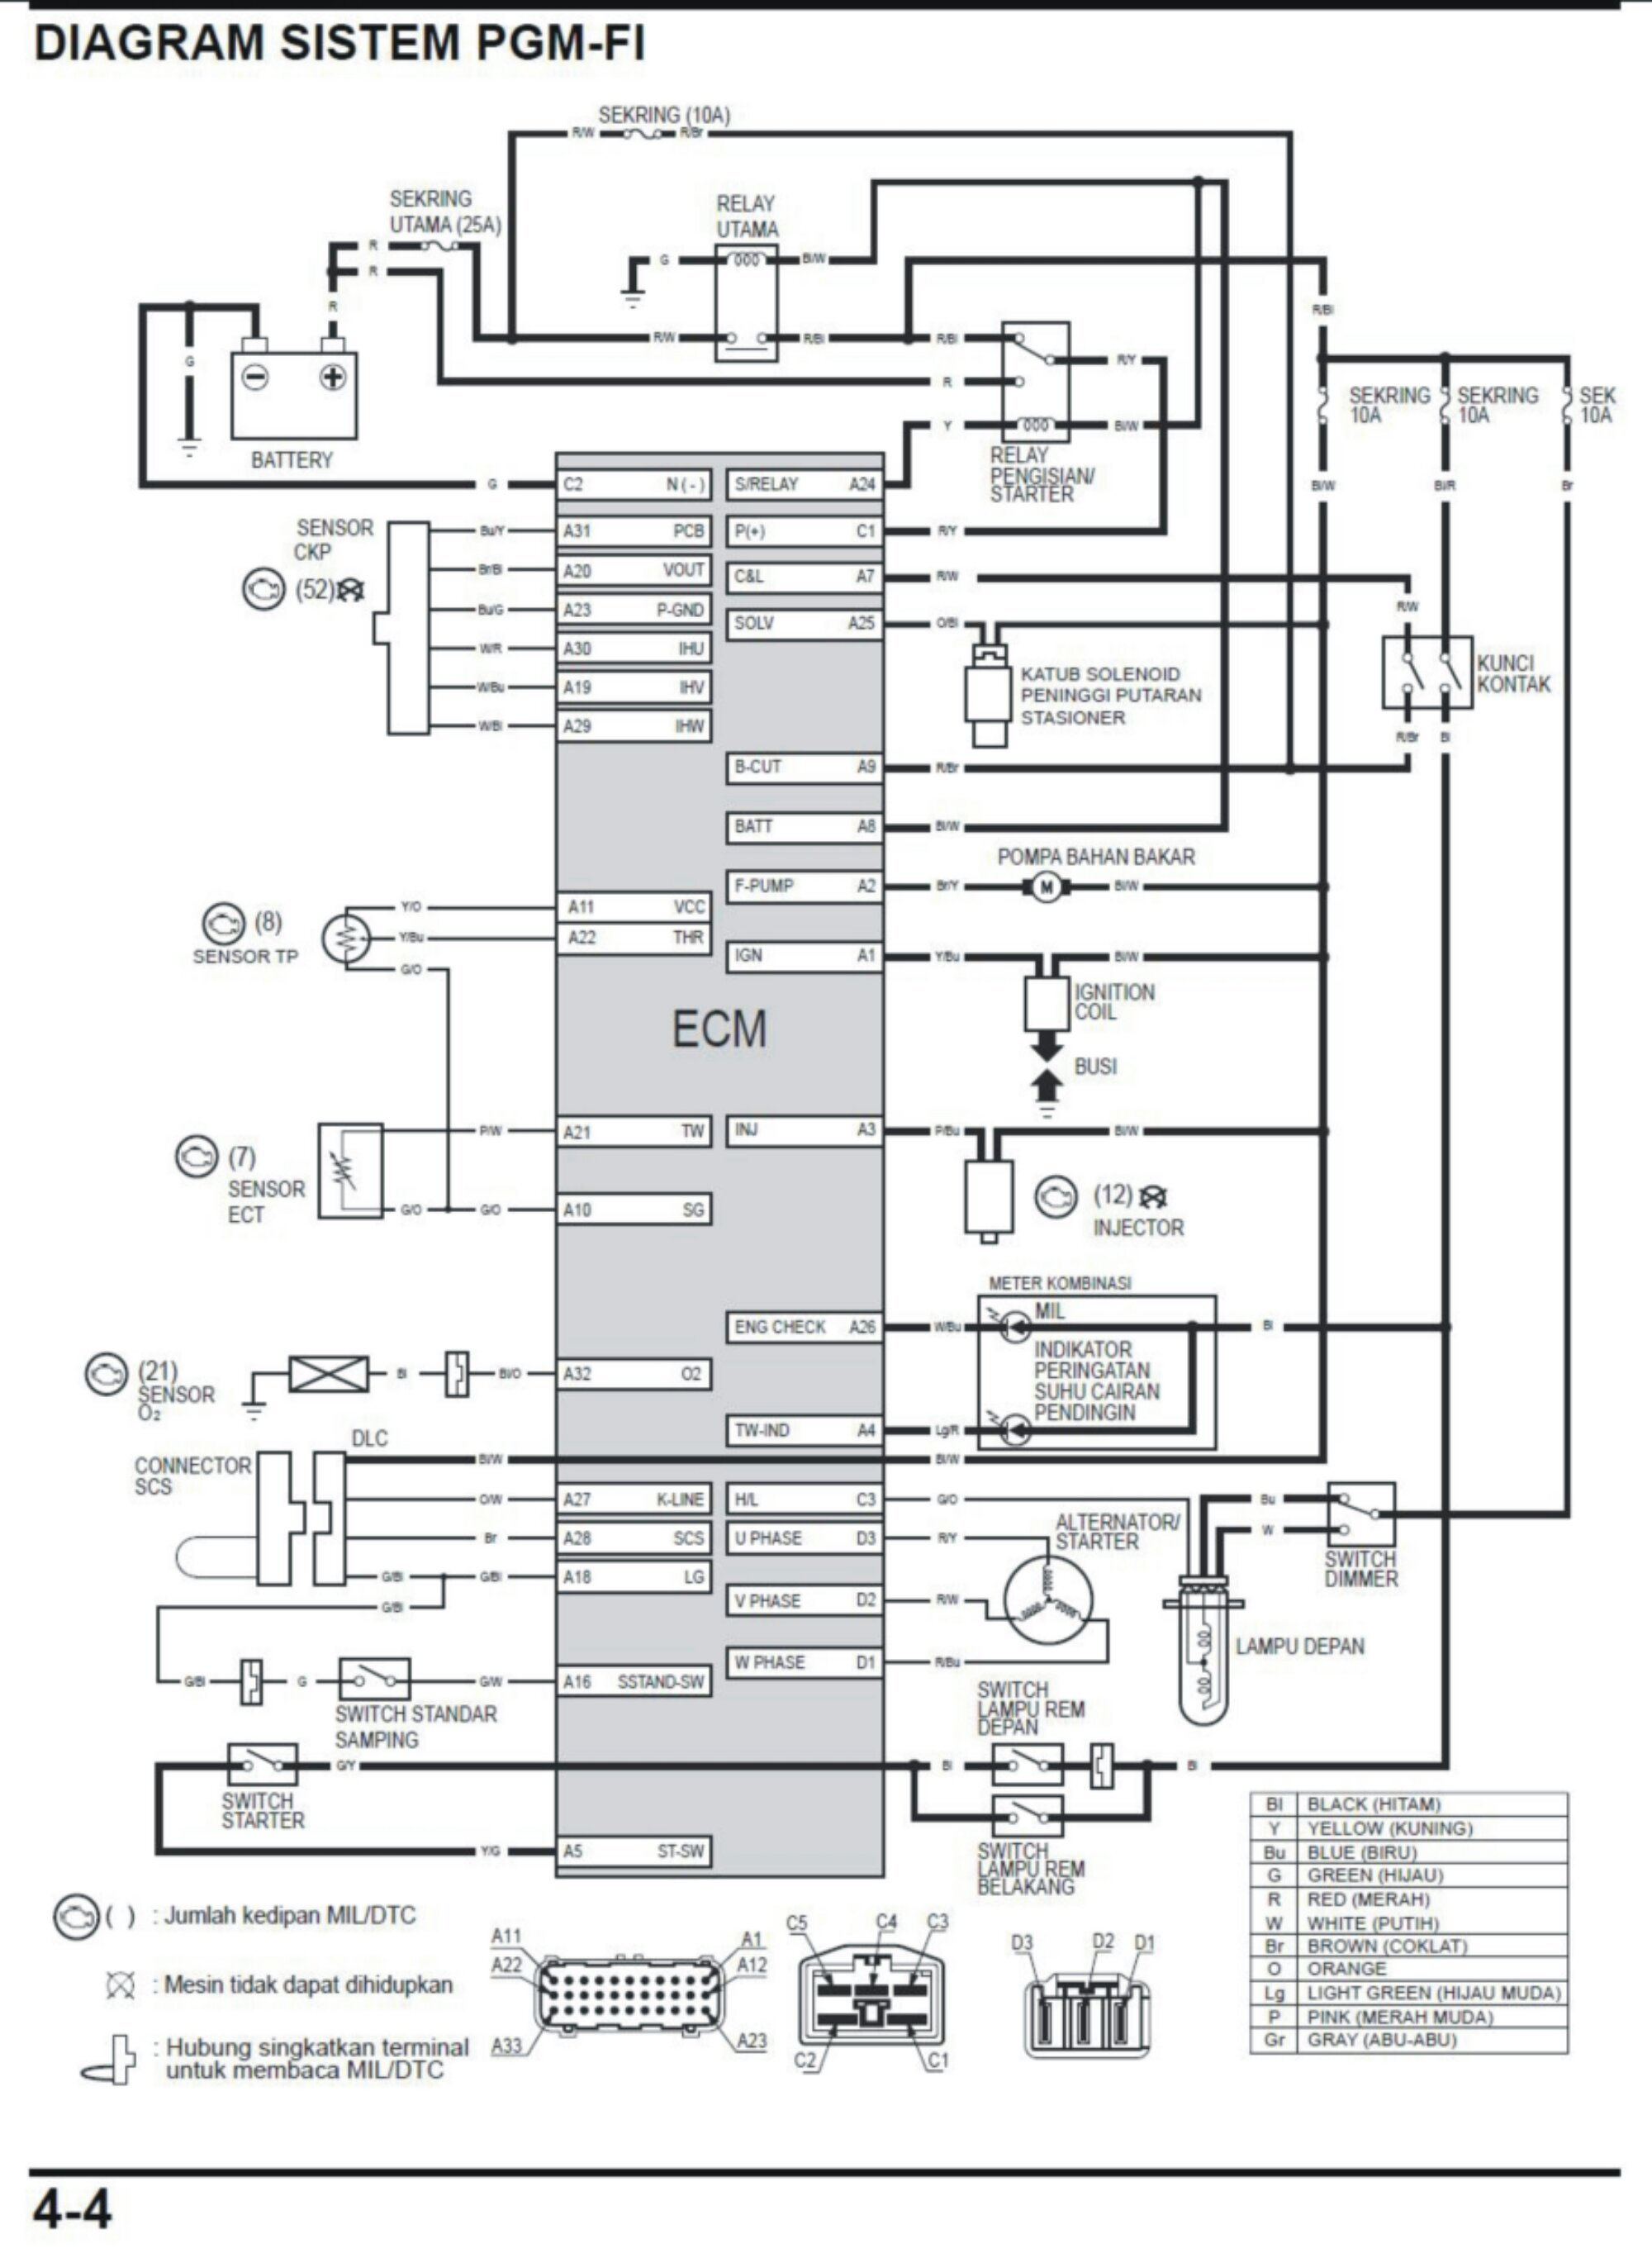 RB_7587] Wiring Diagram Honda Beat Free About Wiring Diagram And Schematic  On Wiring DiagramNorab Anist Ungo Skat Peted Phae Mohammedshrine Librar Wiring 101